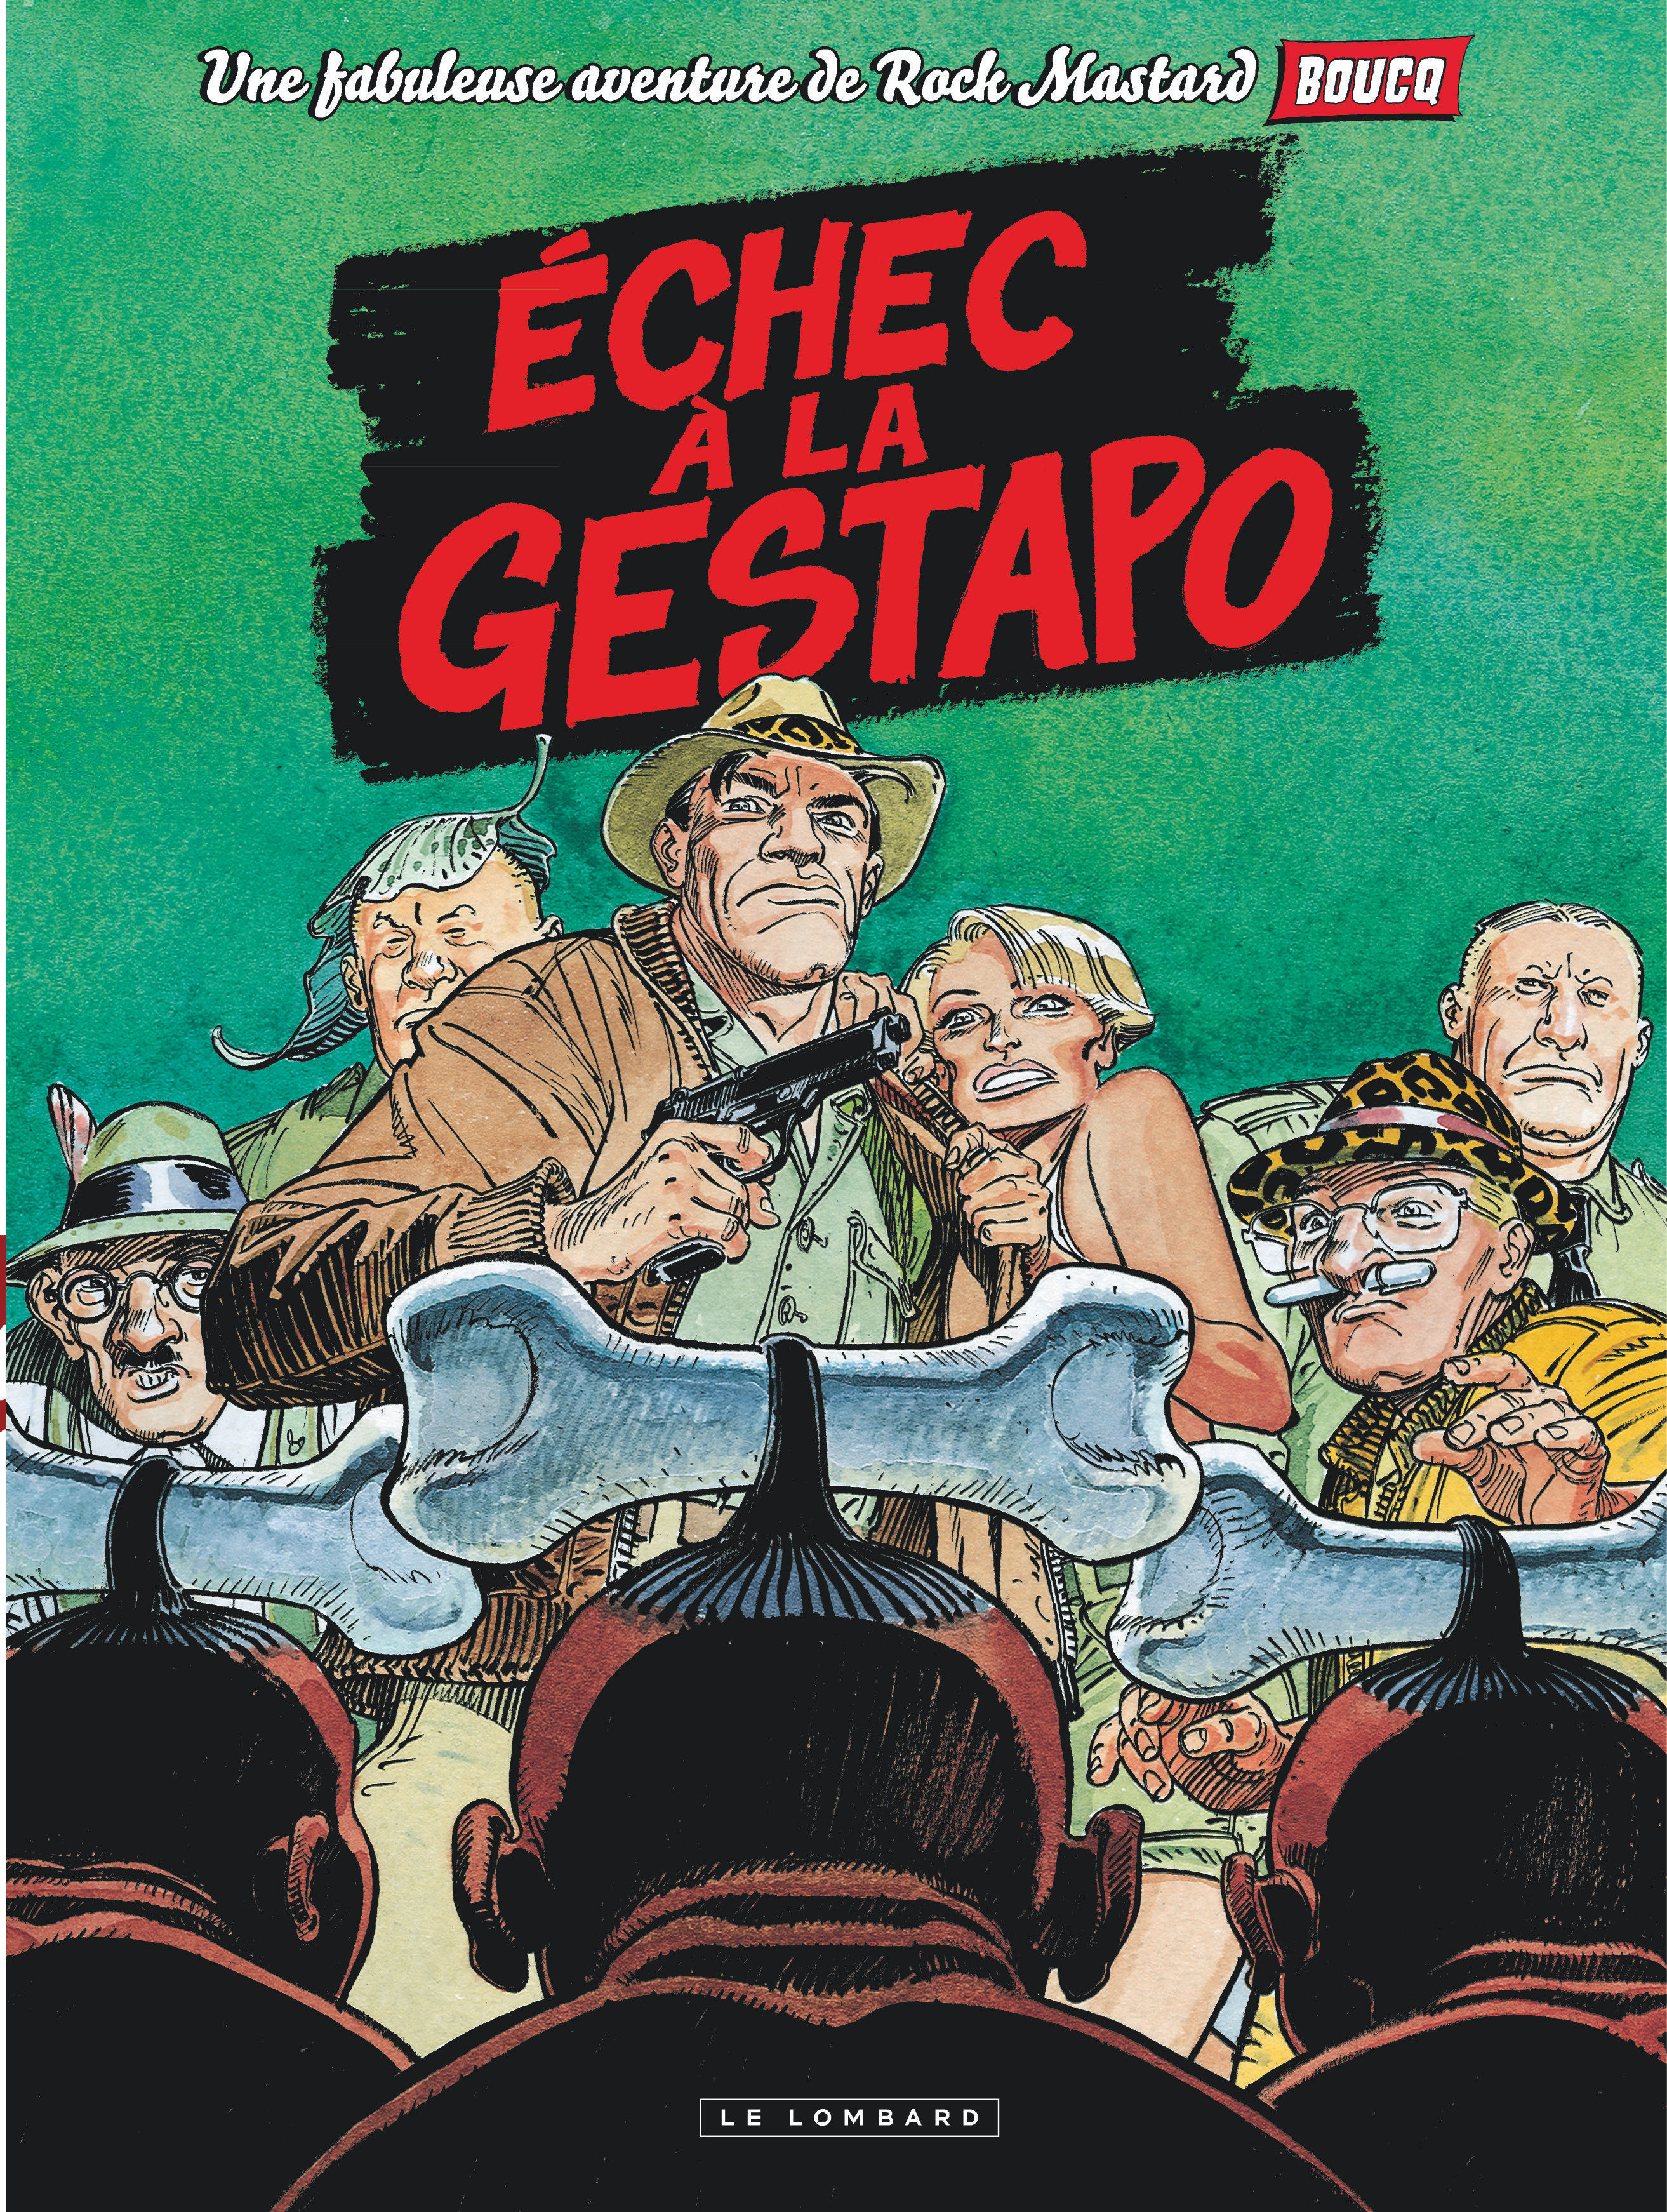 ECHEC A LA GESTAPO